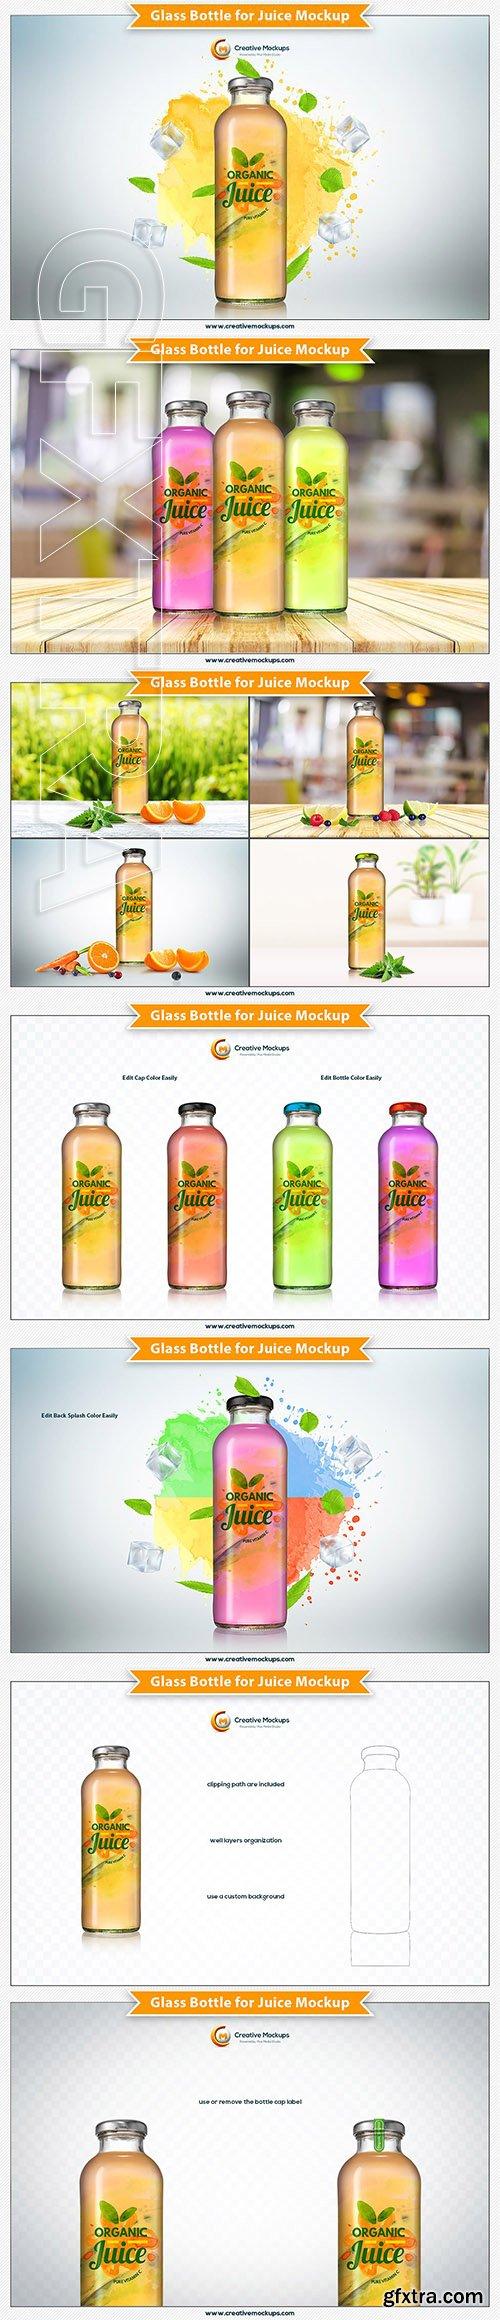 CreativeMarket - Glass Bottle for Juice Mockup 2941755